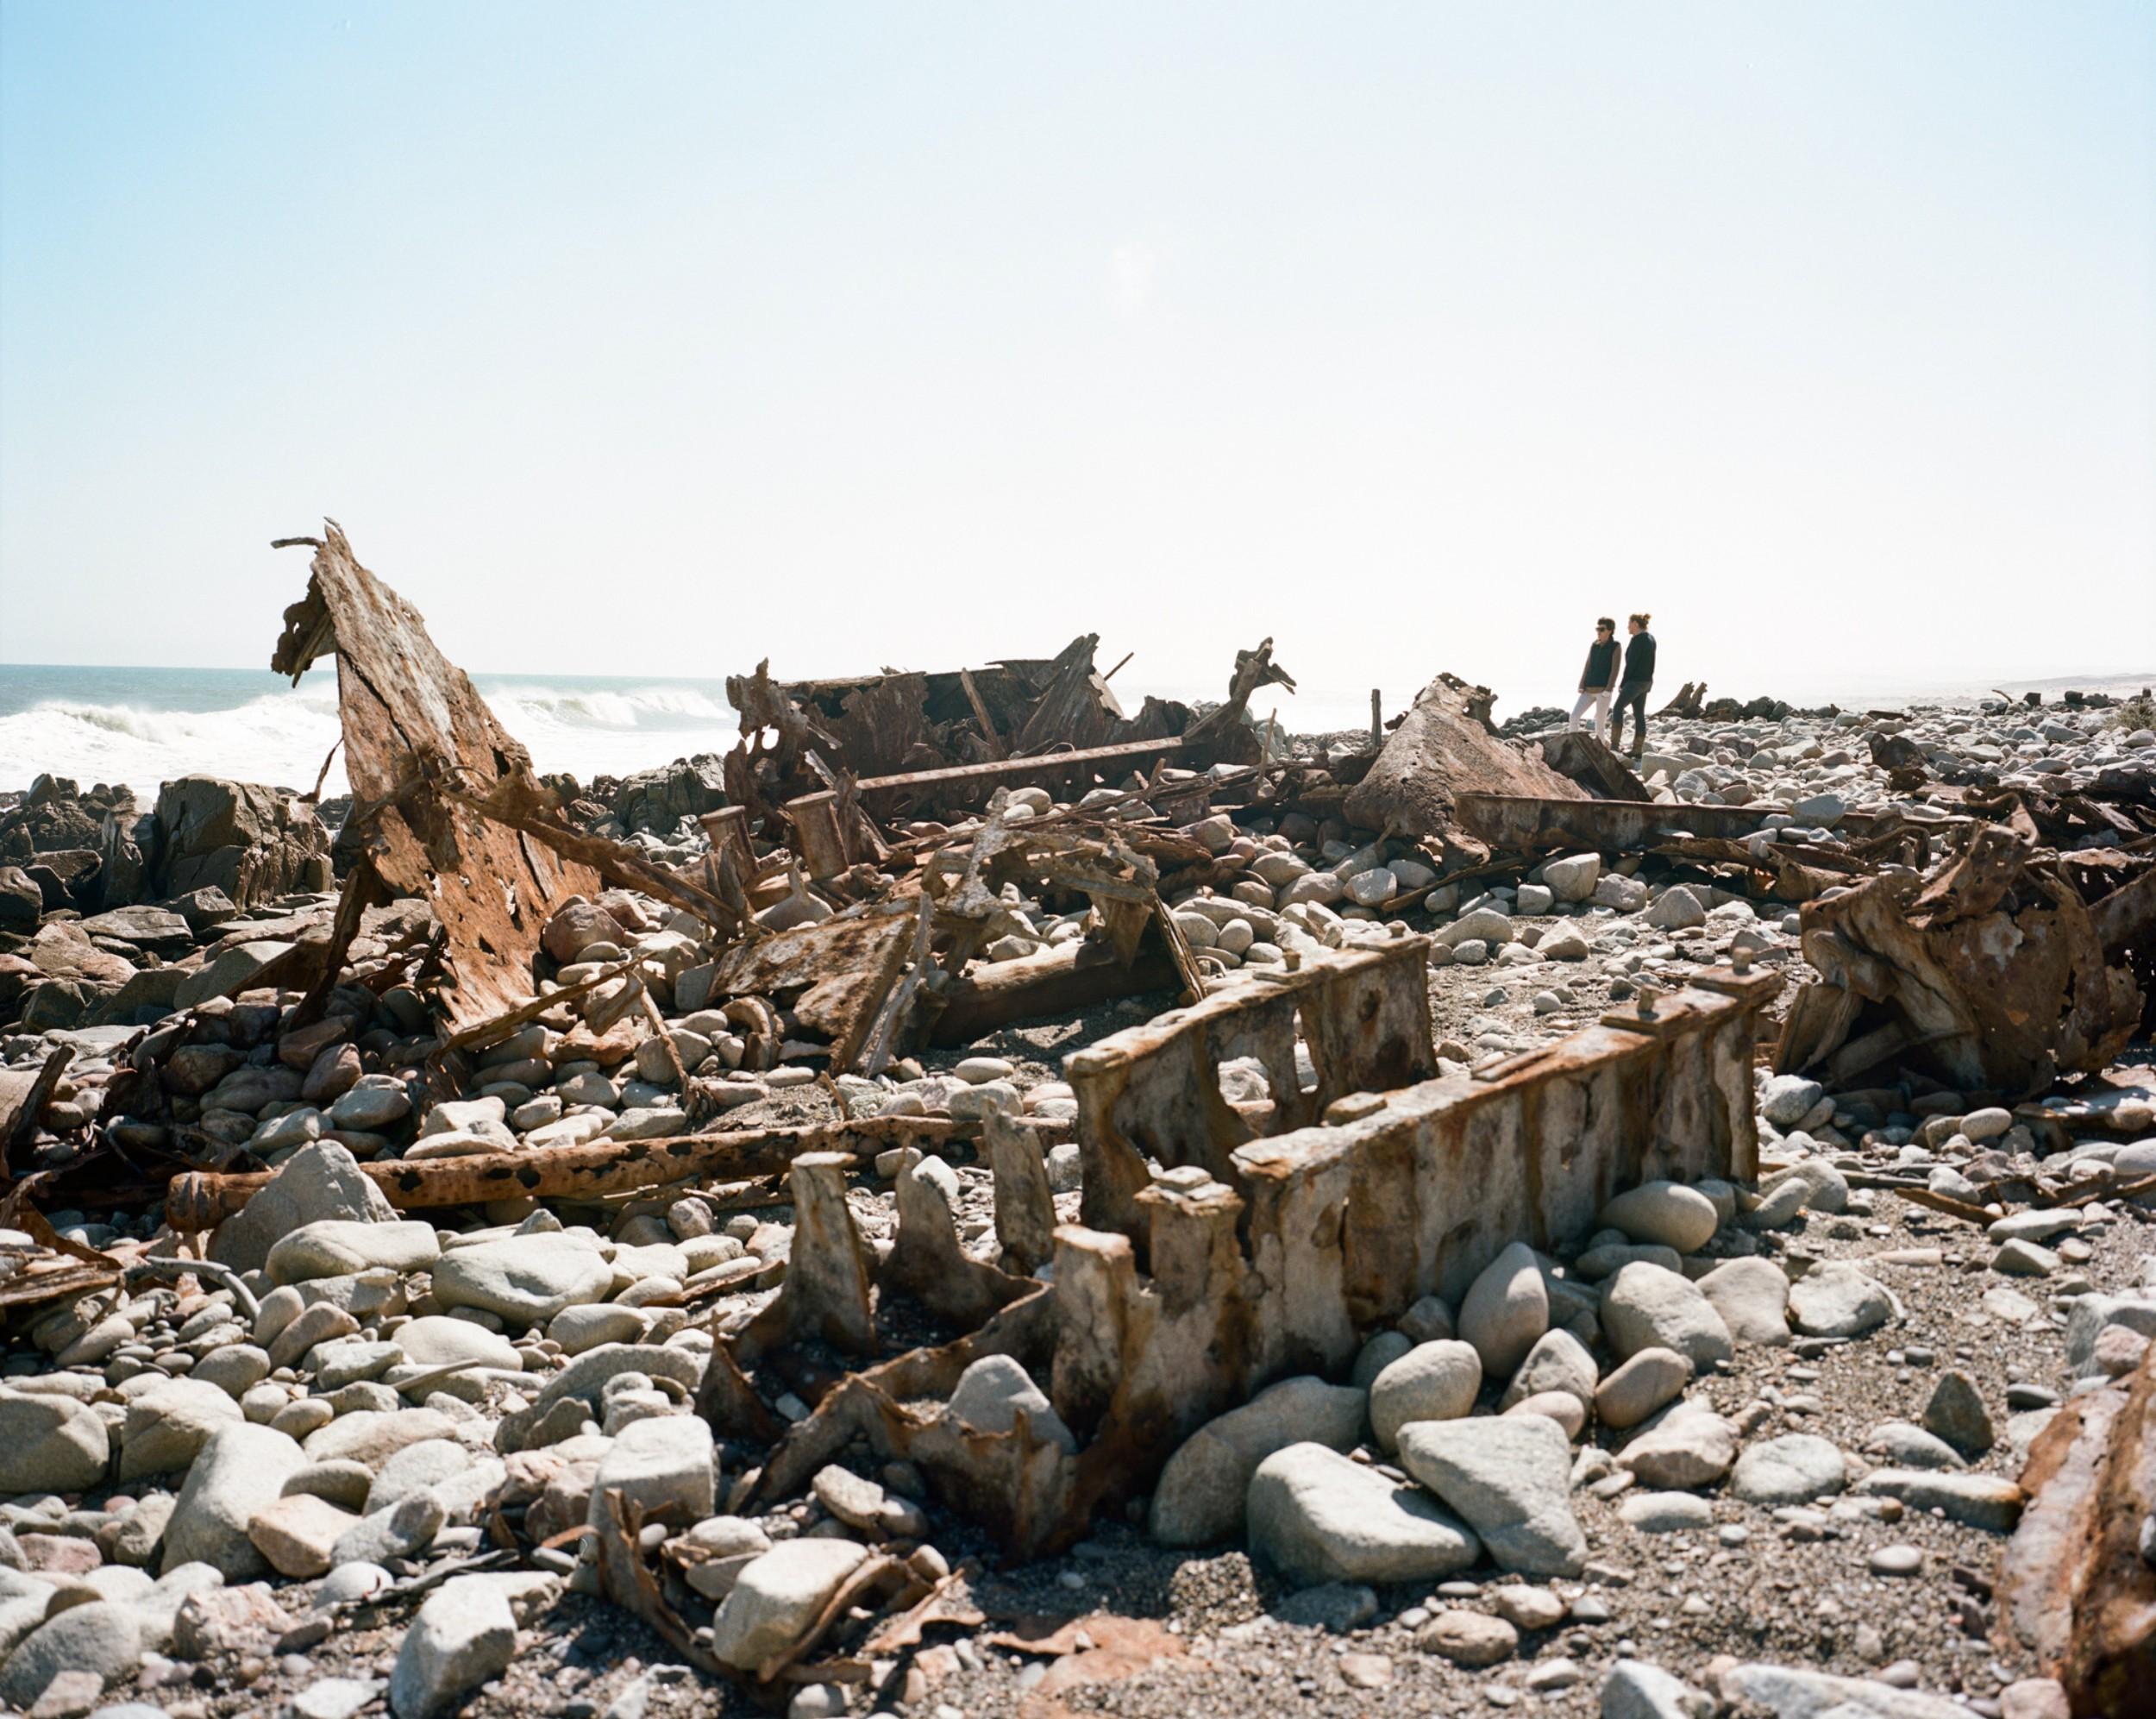 27Shipwreck Lodge - Activities - Shipwrecks along the coastline.jpg